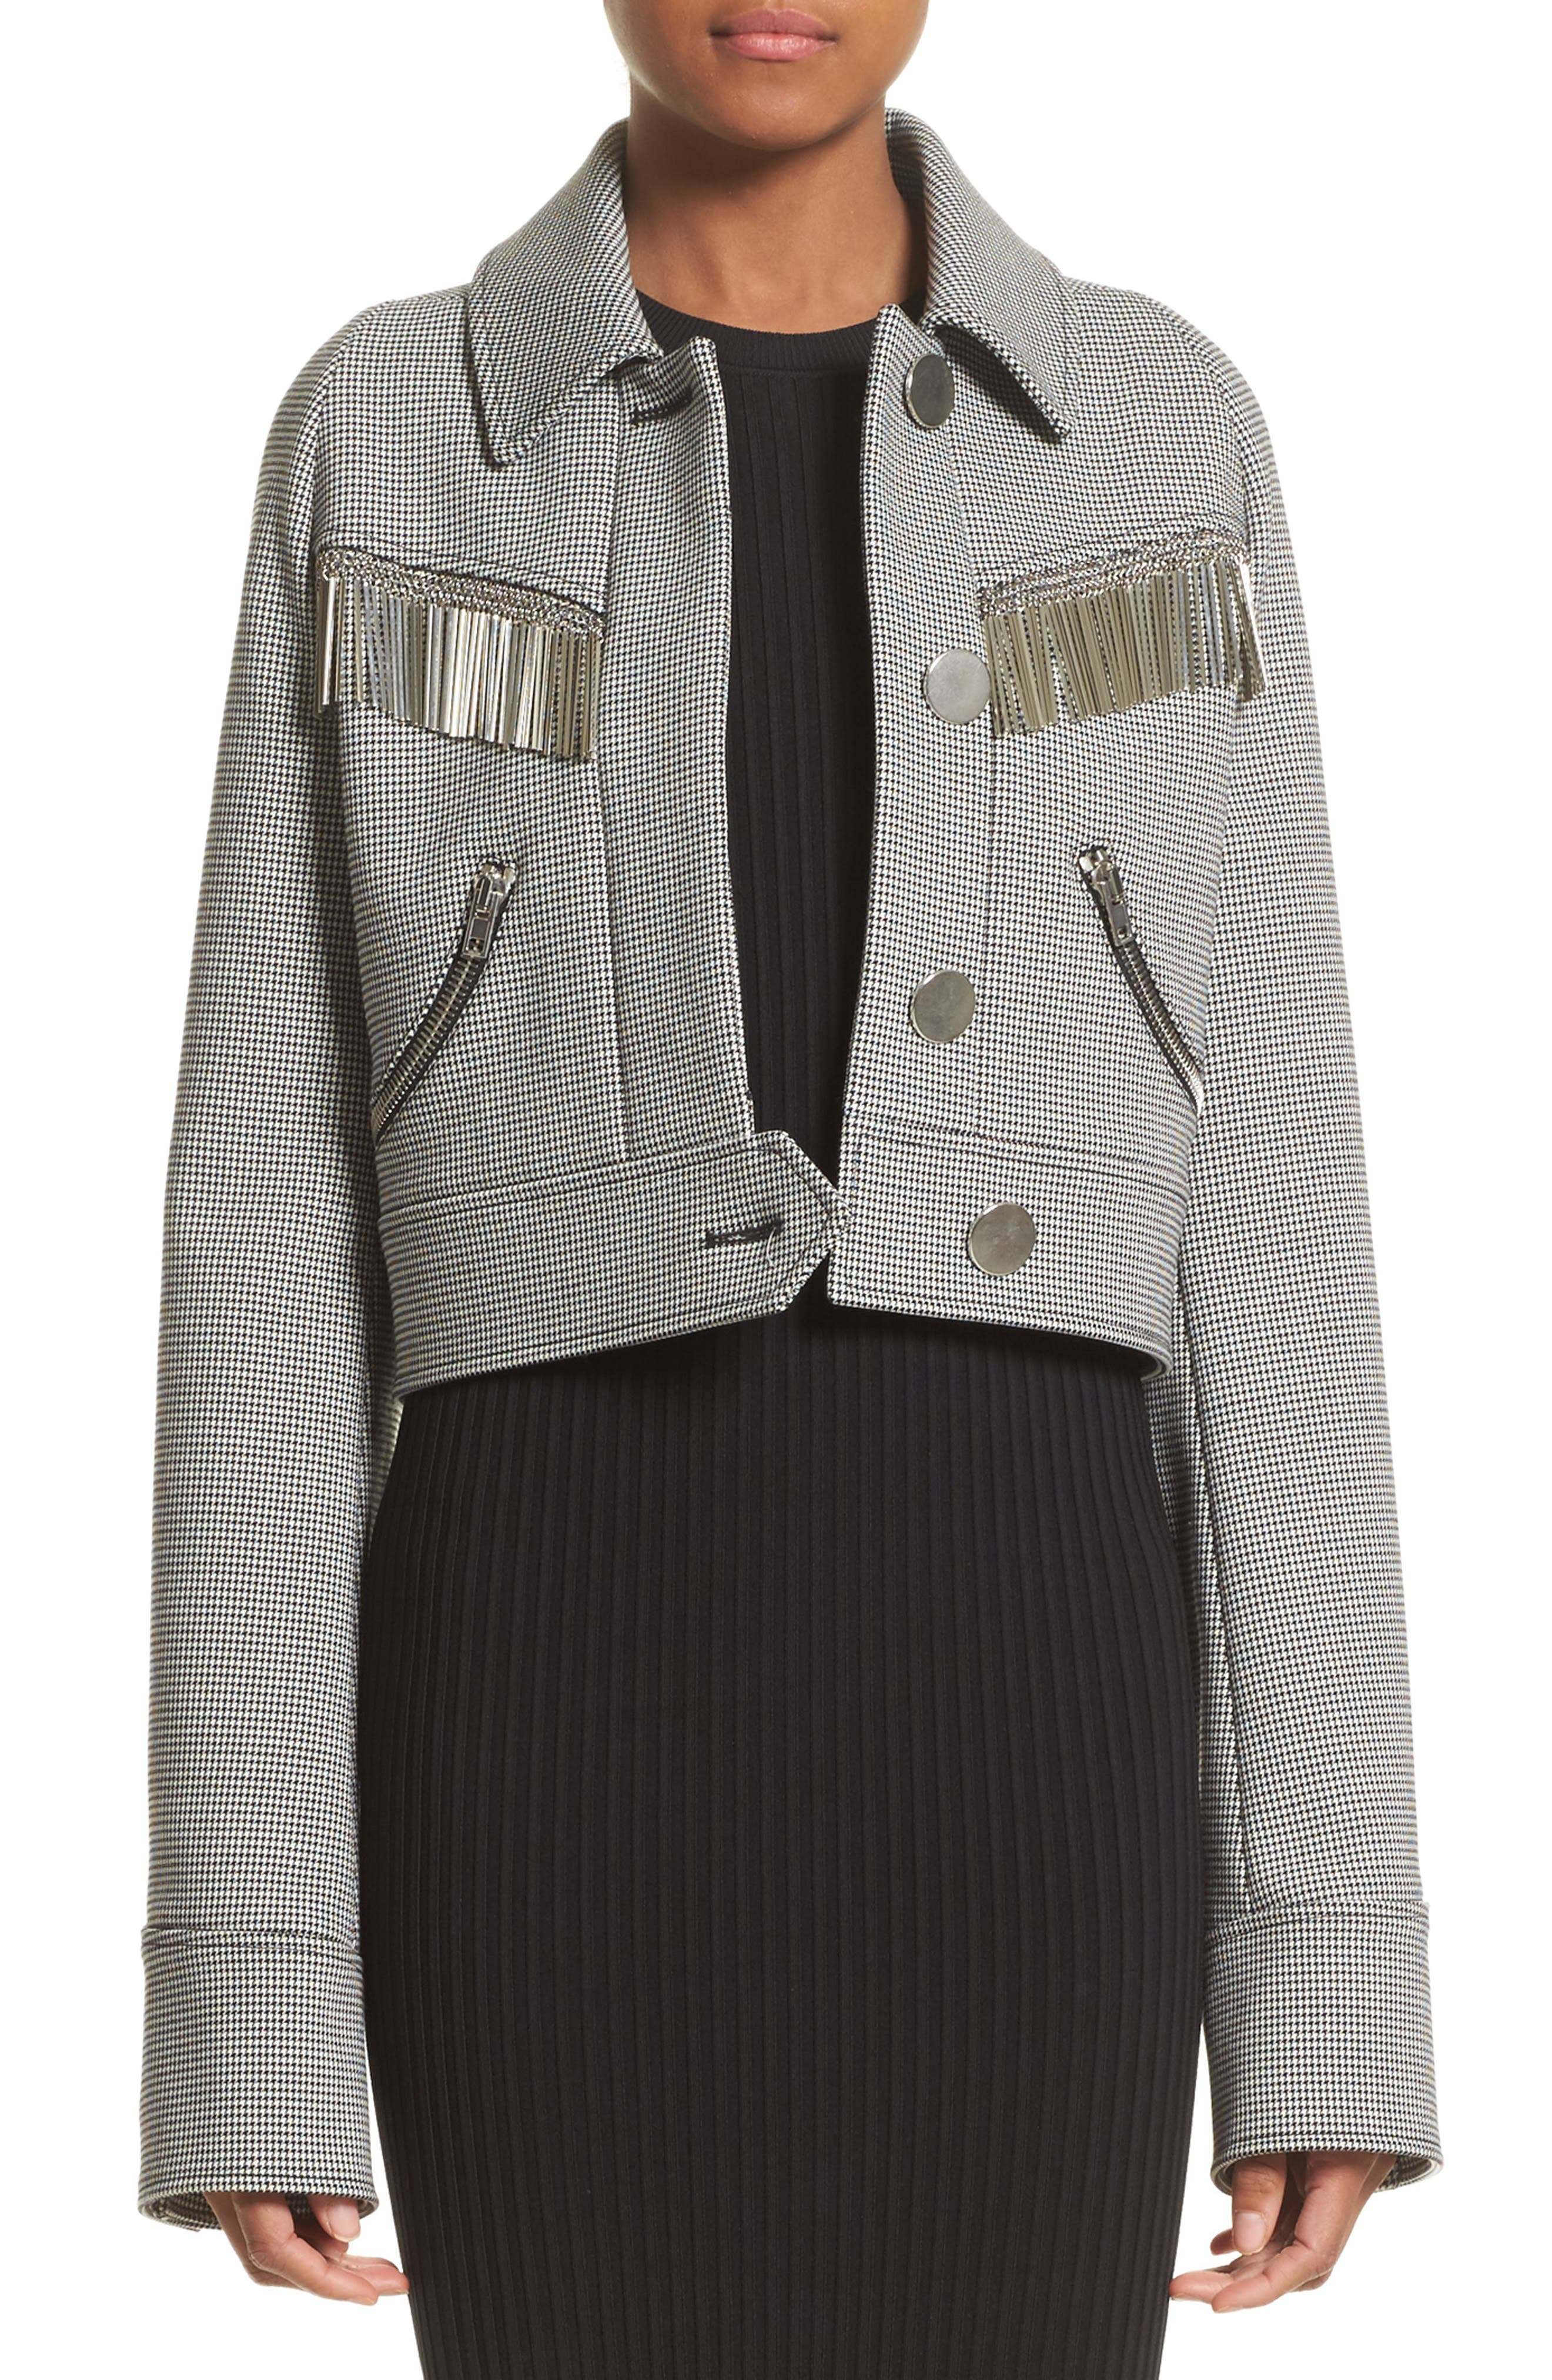 Alexander Wang Fringe Crop Jacket